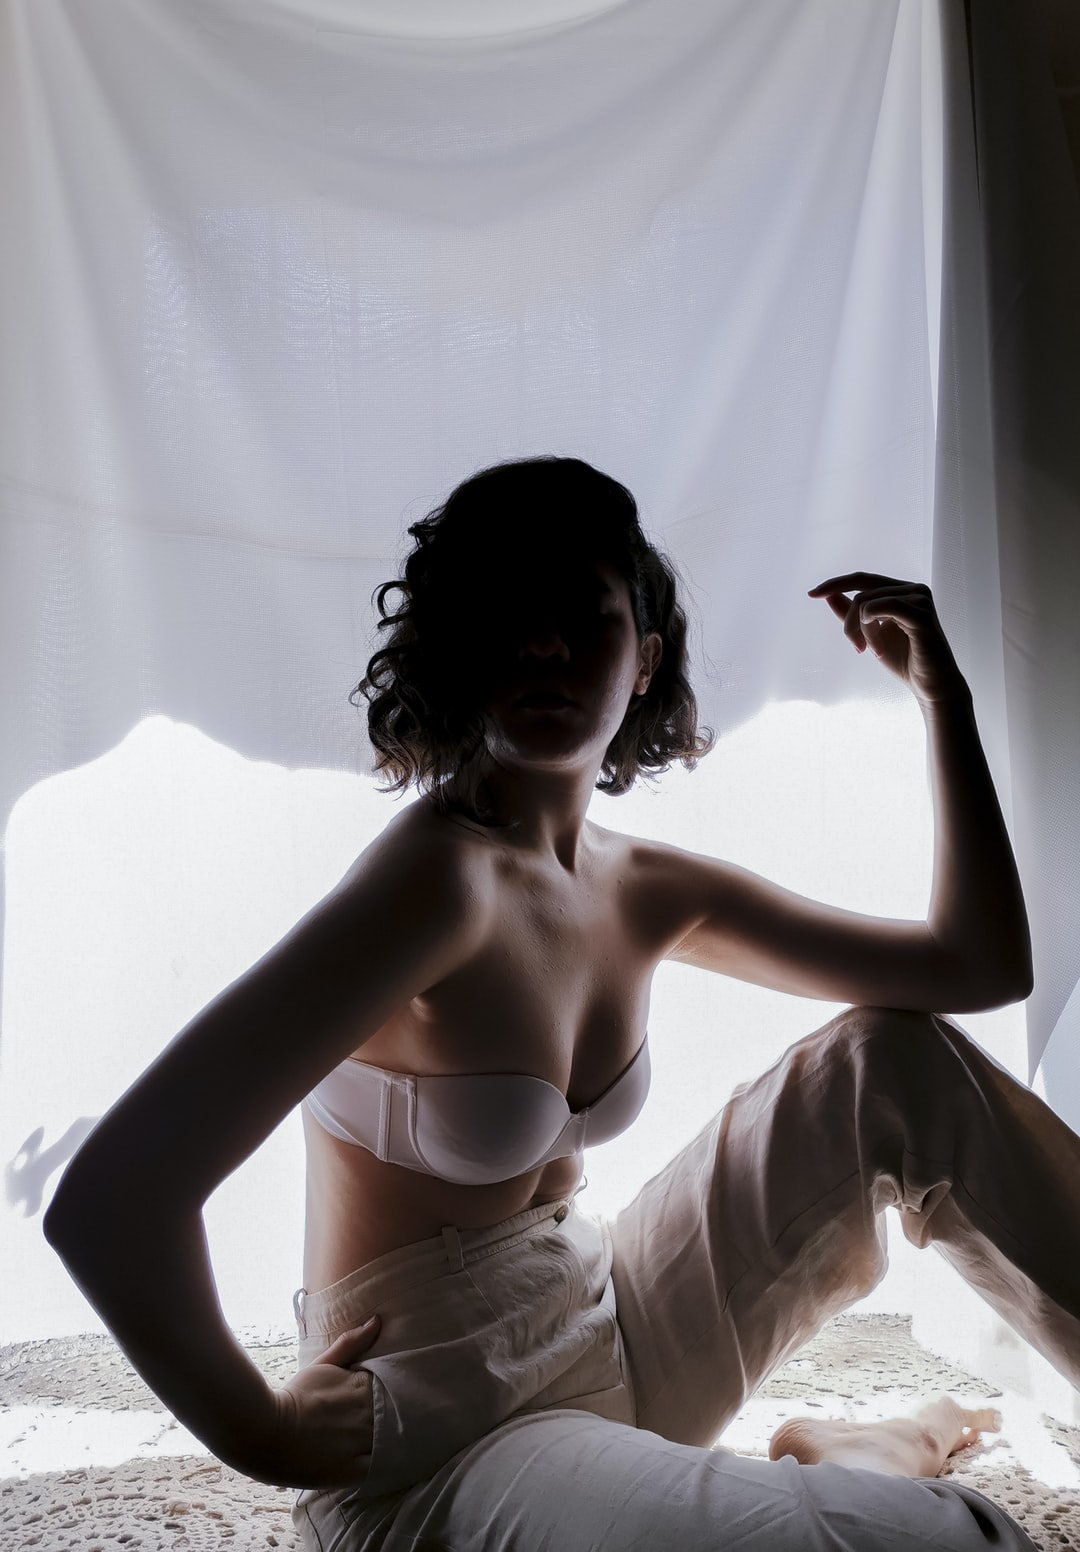 Window, natural light.